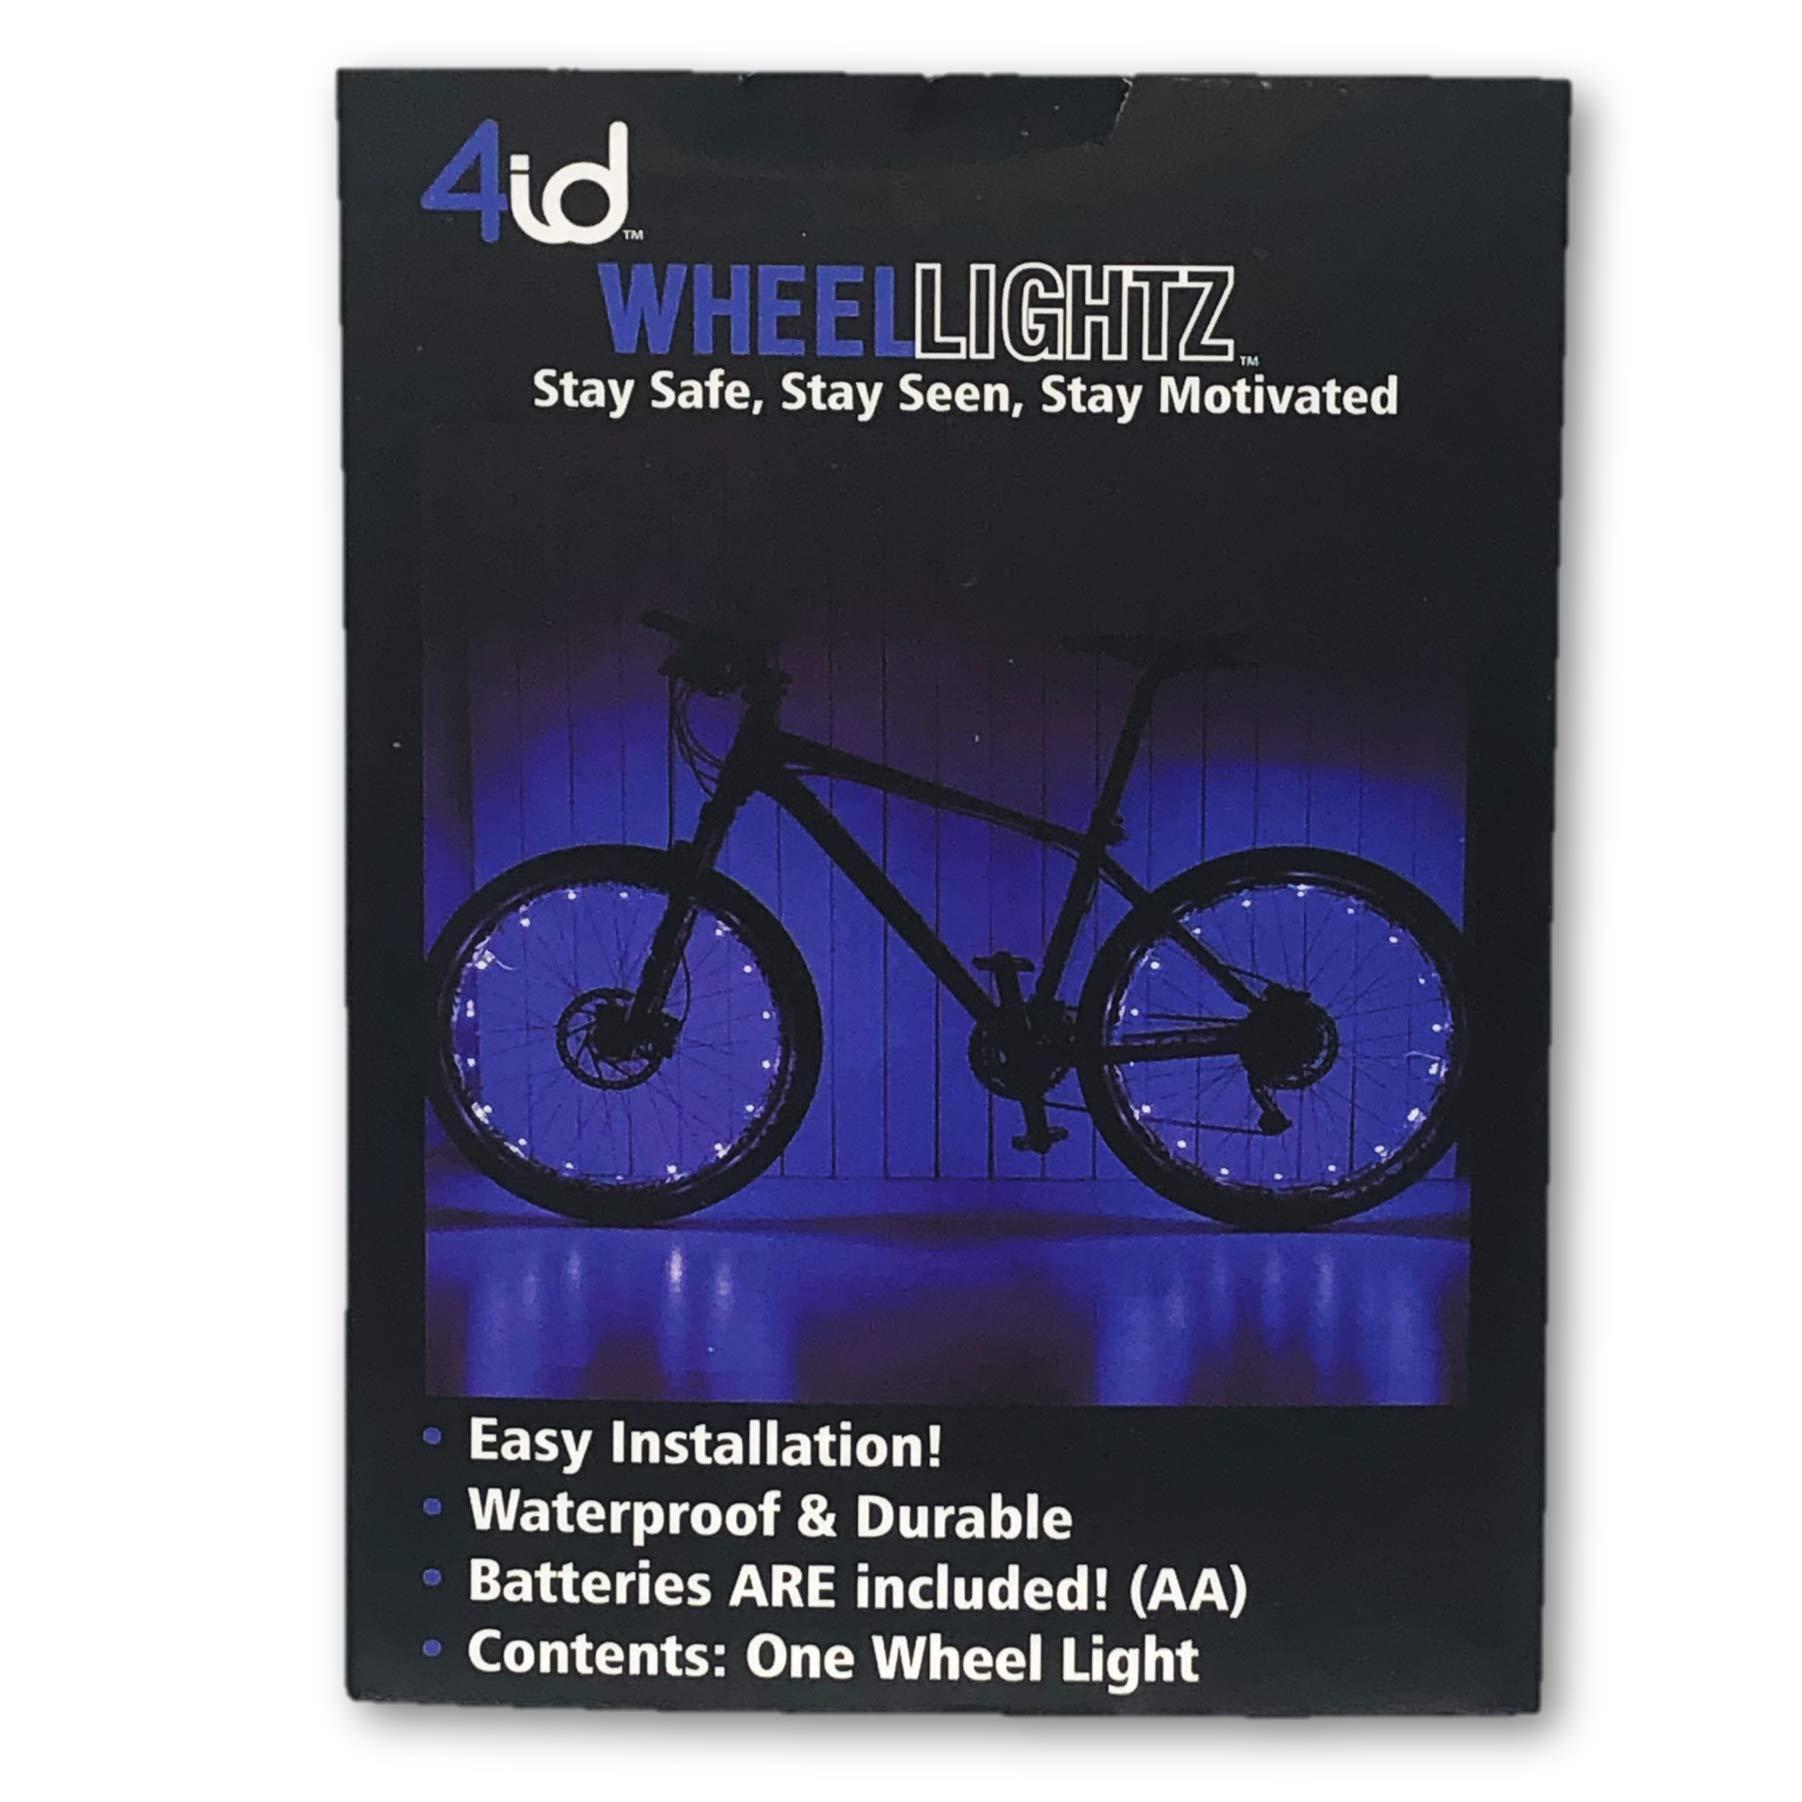 4ID   Wheel Lightz   Ultra Bright LED Bike Safety Lights   2 Light Settings